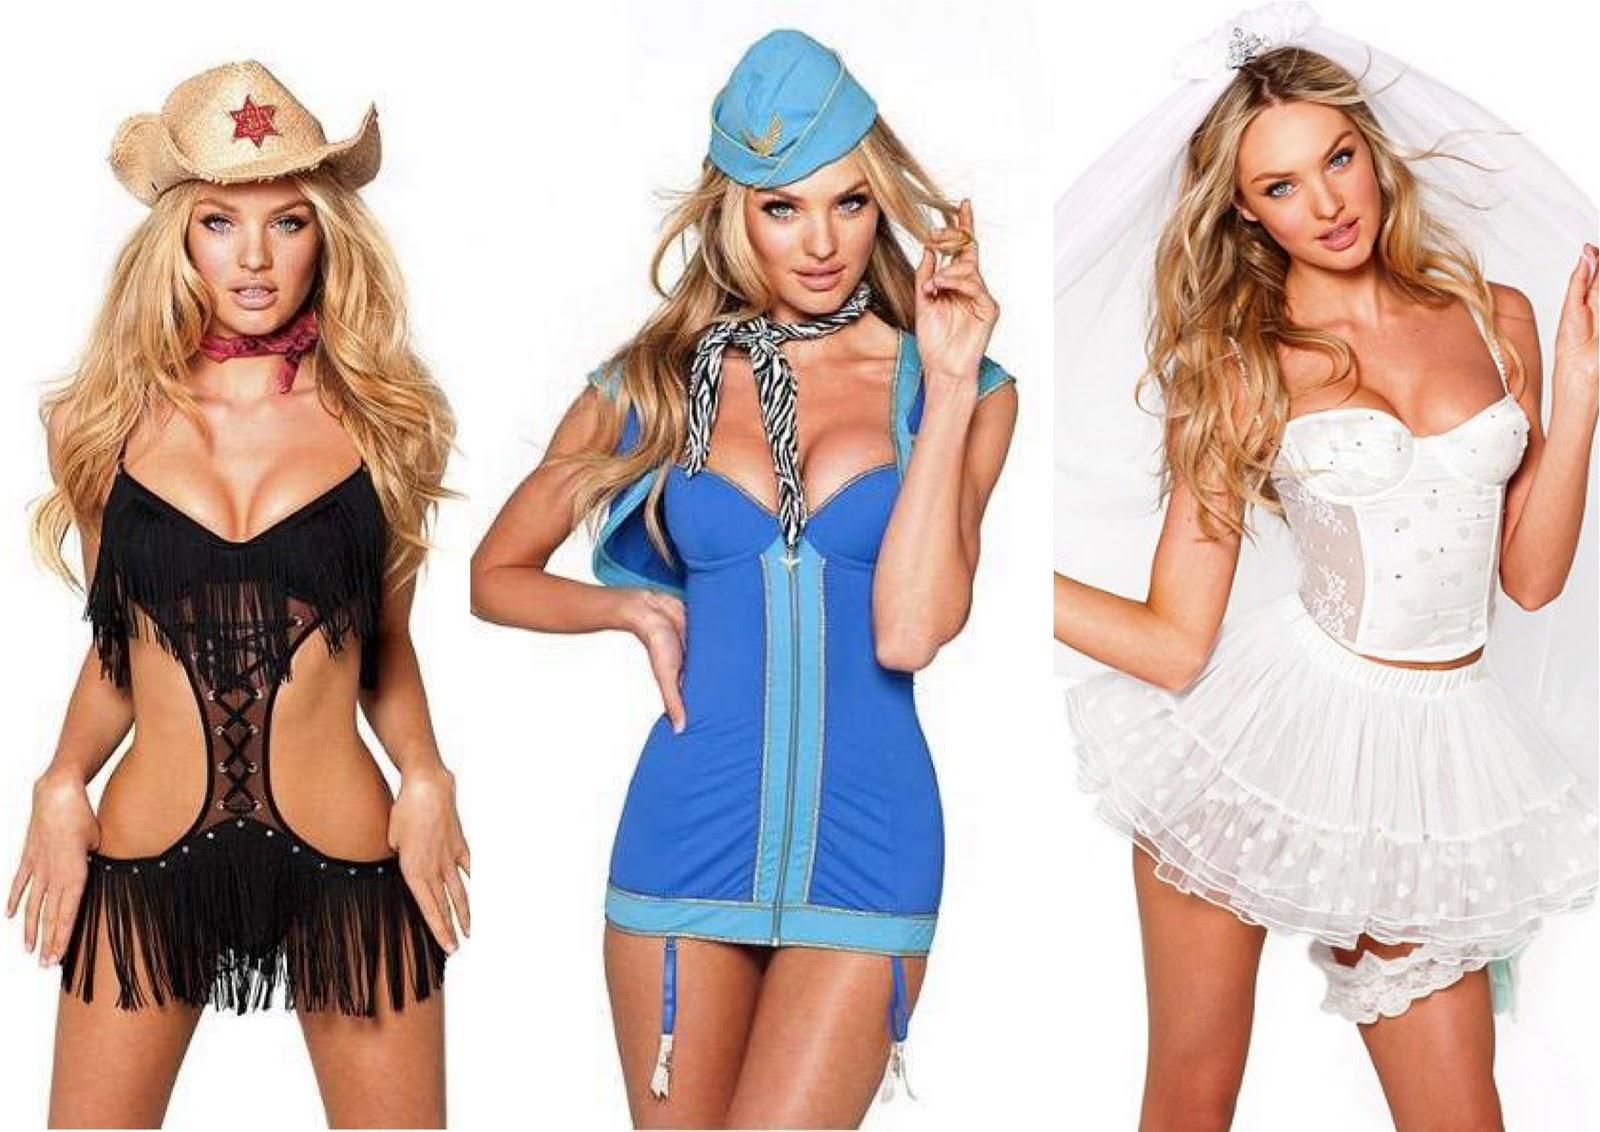 http://2.bp.blogspot.com/_PfmV3qvy8FY/TMj3ctn_l4I/AAAAAAAAALU/8fzwyAHvlf0/s1600/la+modella+mafia+lingerie+halloween+costumes+via+victoriassecret.jpg